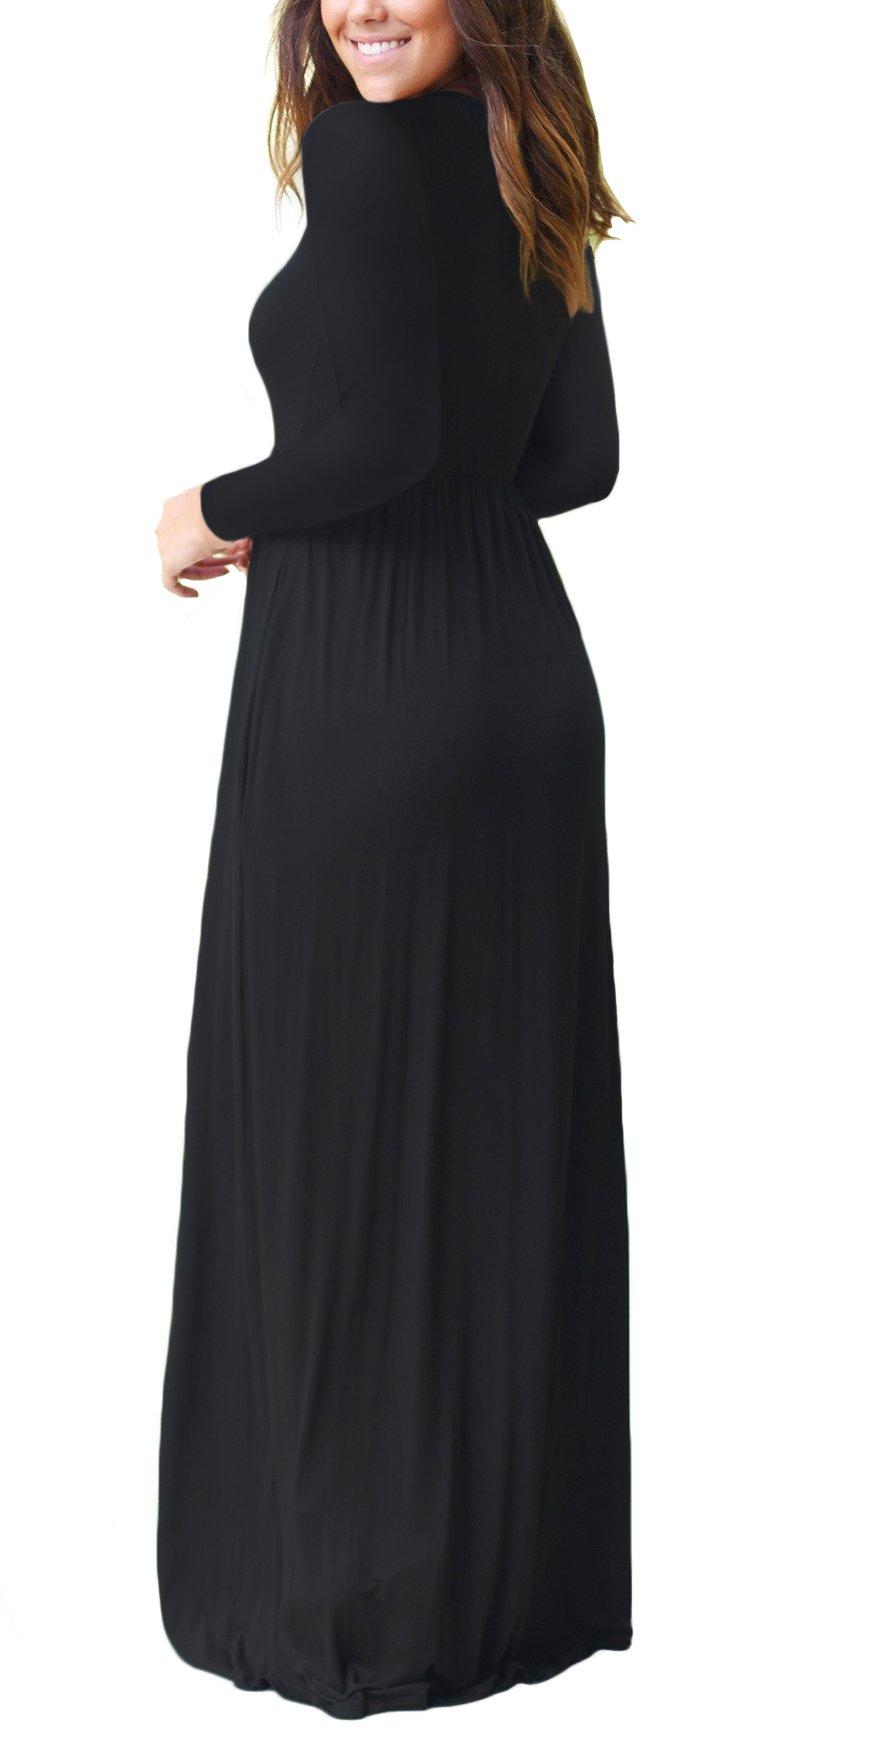 DEARCASE Women Long Sleeve Loose Plain Maxi Pockets ...